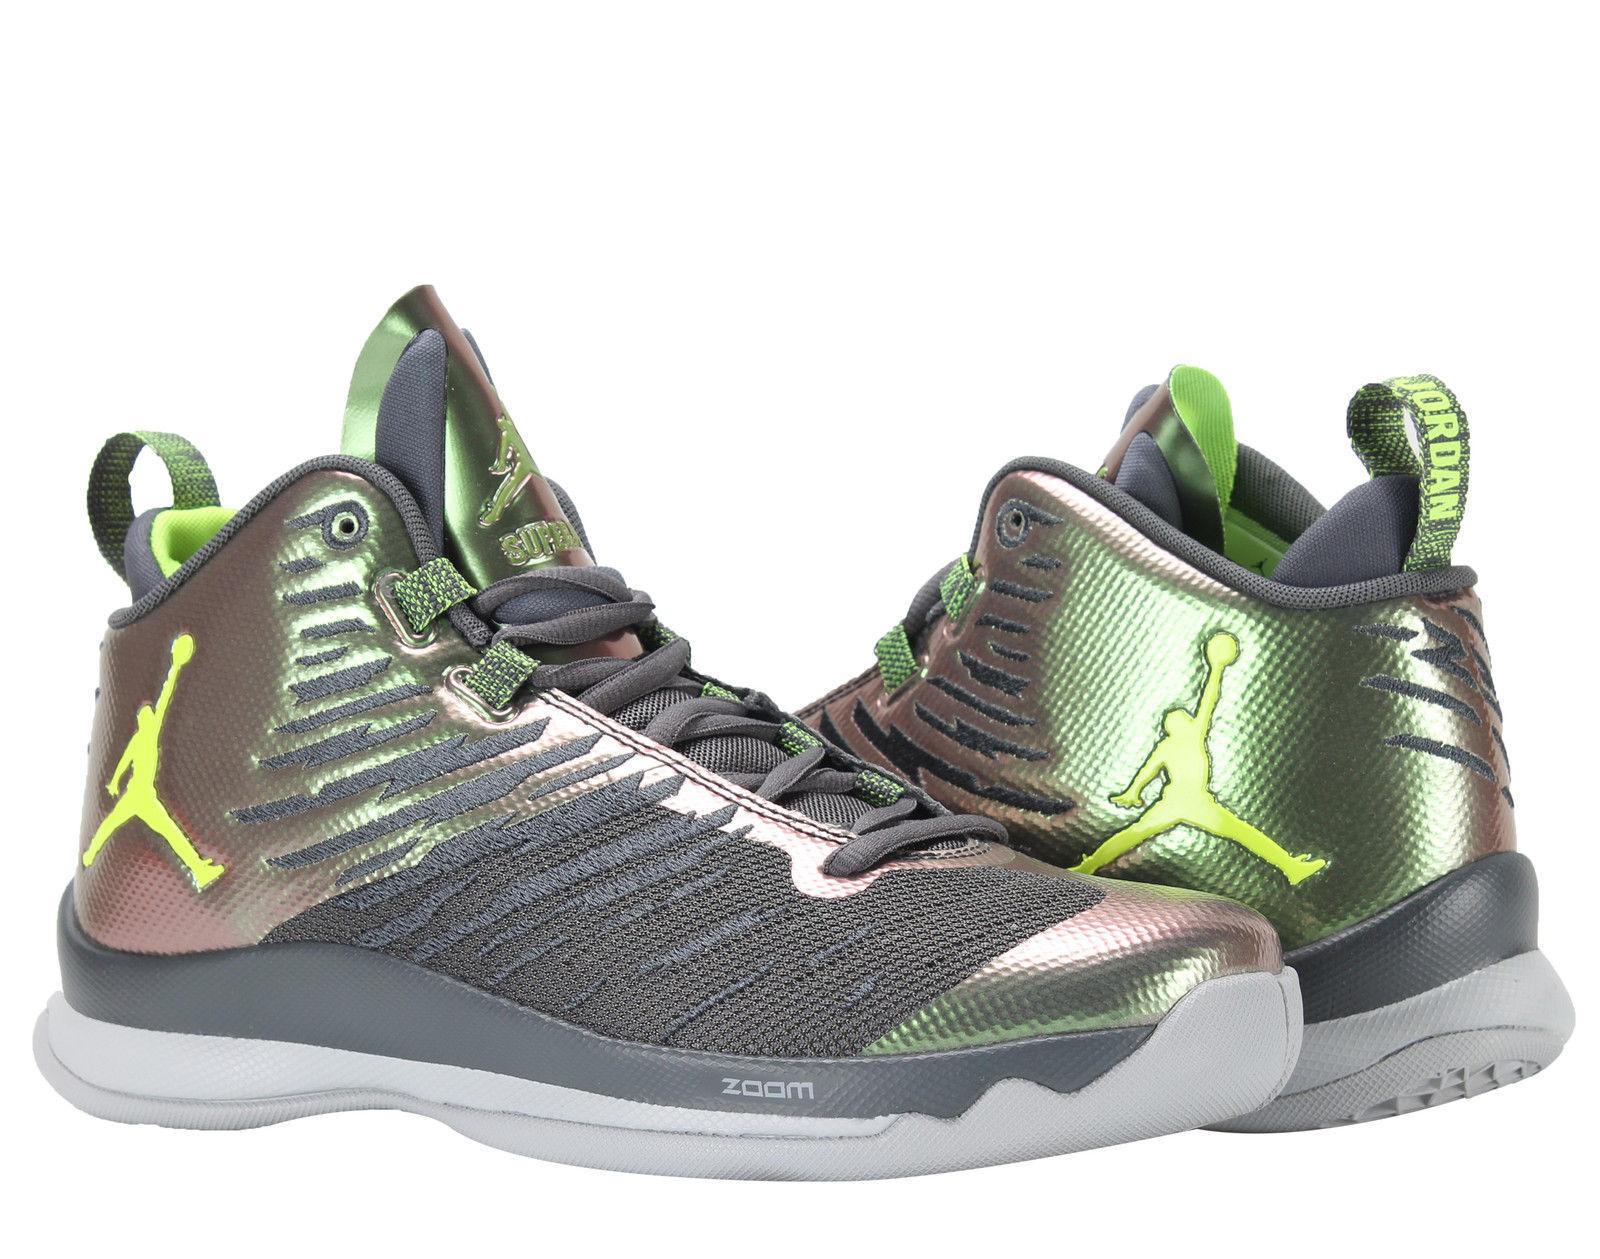 Air Jordan Super Fly 5 Dark Grey Volt Men's Basketball shoes SZ 12